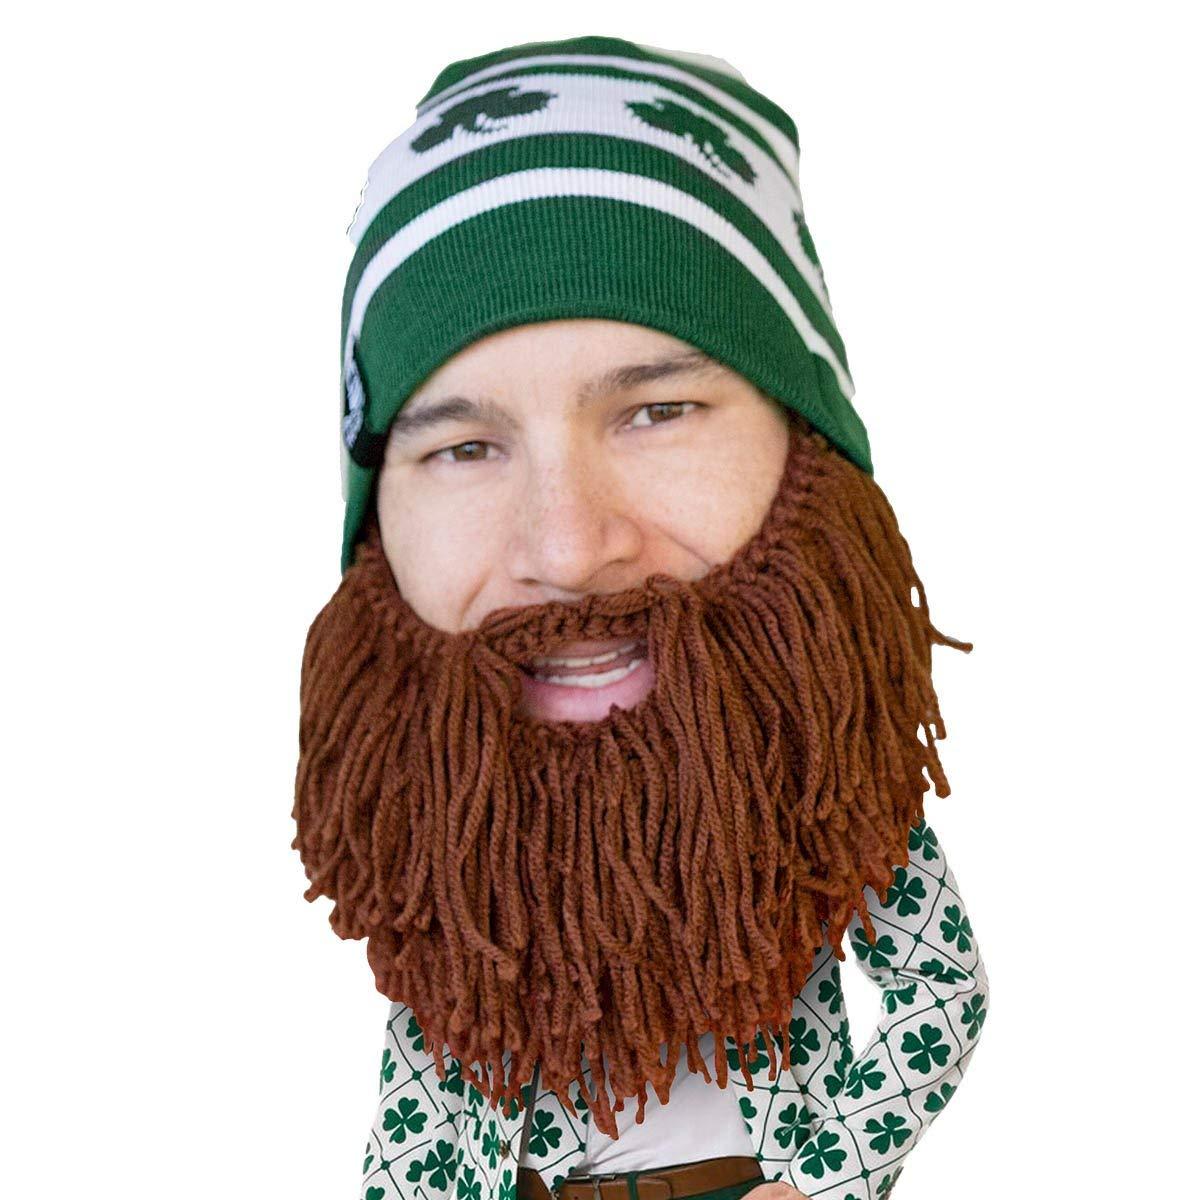 dddc0894246 Get Quotations · Beard Head - The Original Shamrock Knit Beard Hat